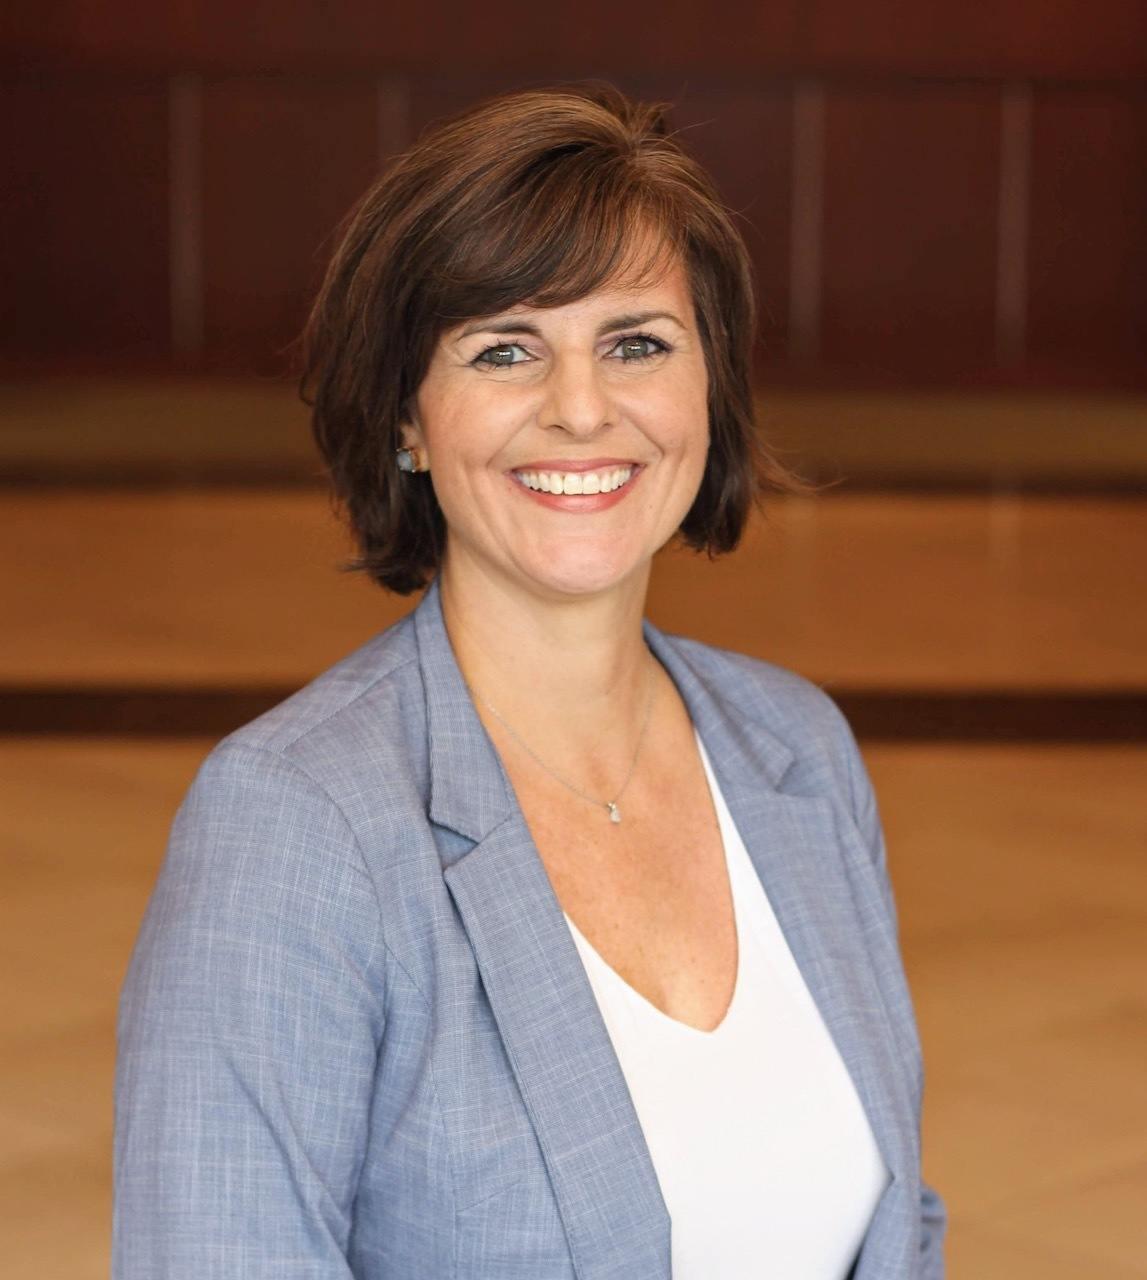 Monica Hoyer